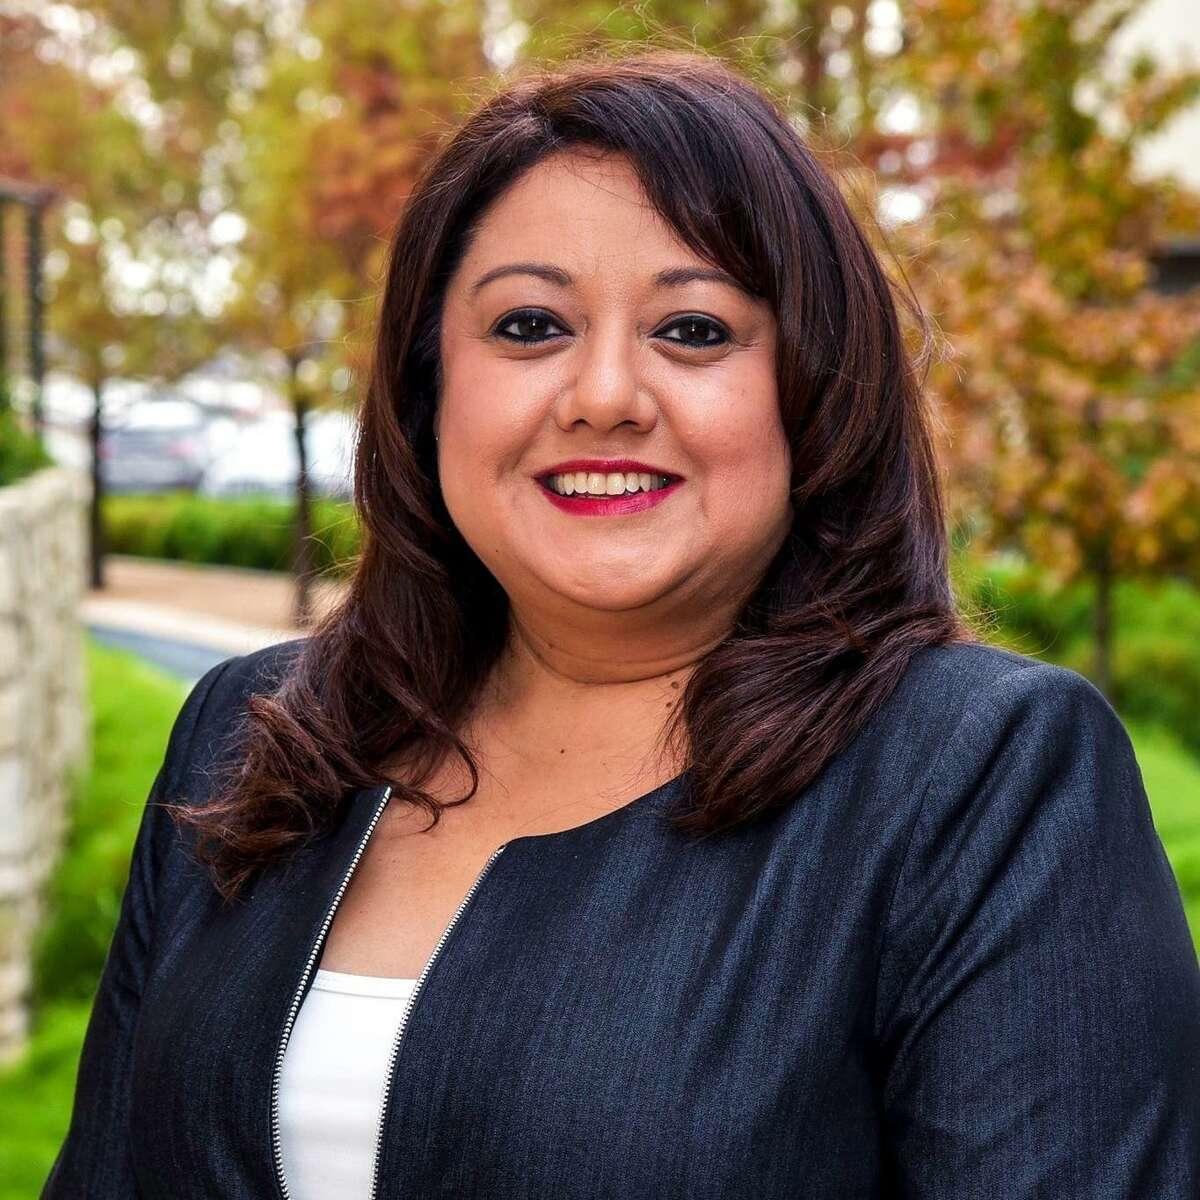 Monica Ramirez Alcantara, candidate for Bexar County Democratic Party Chair.